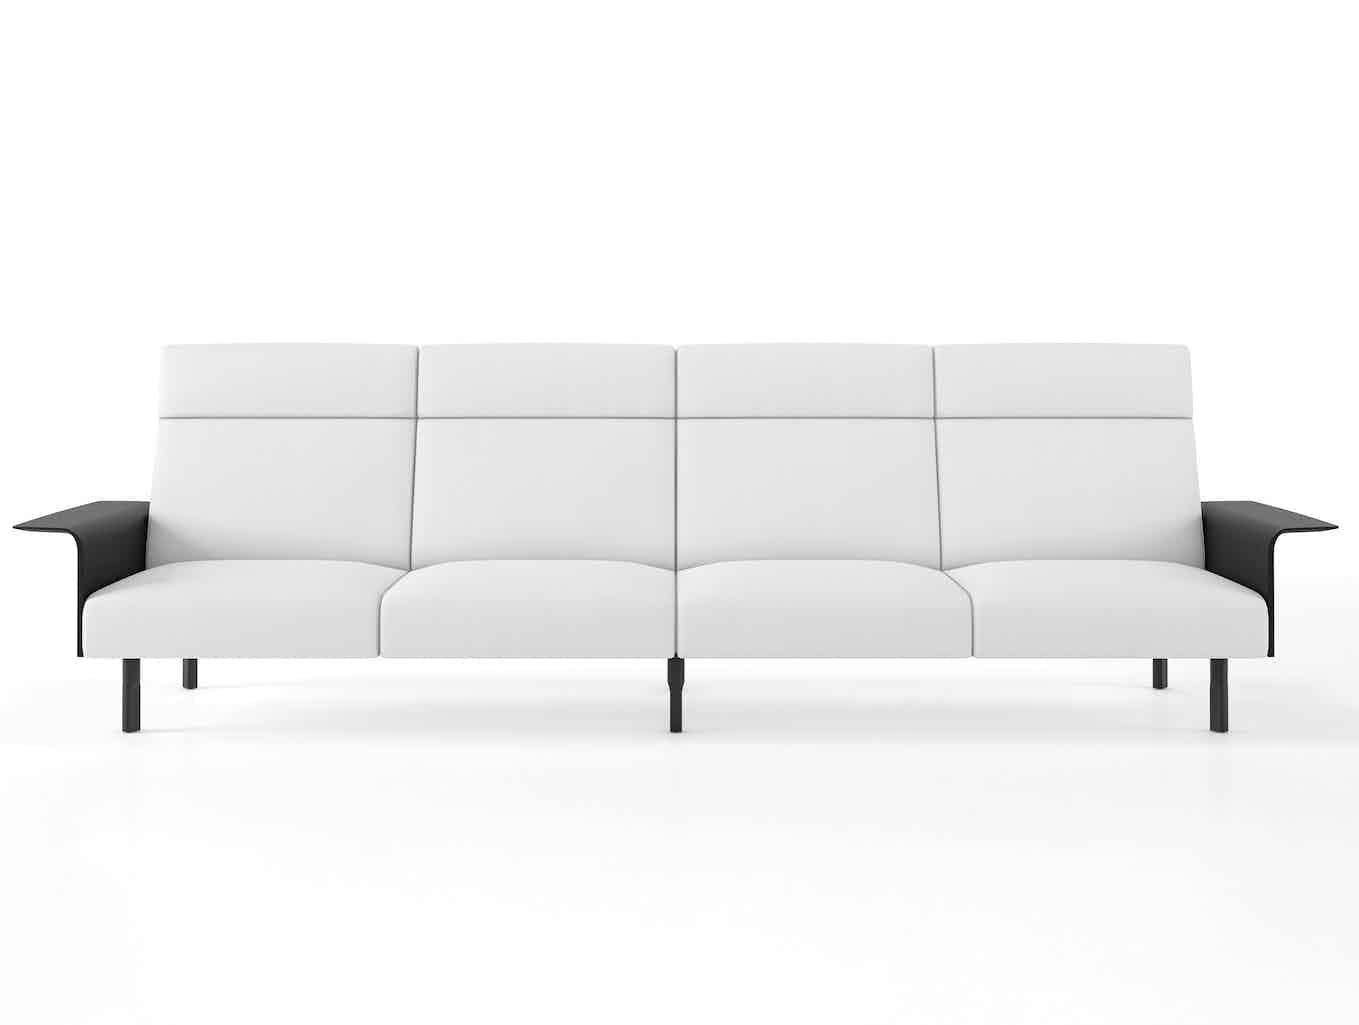 Viccarbe-white-sistema-leg-haute-living